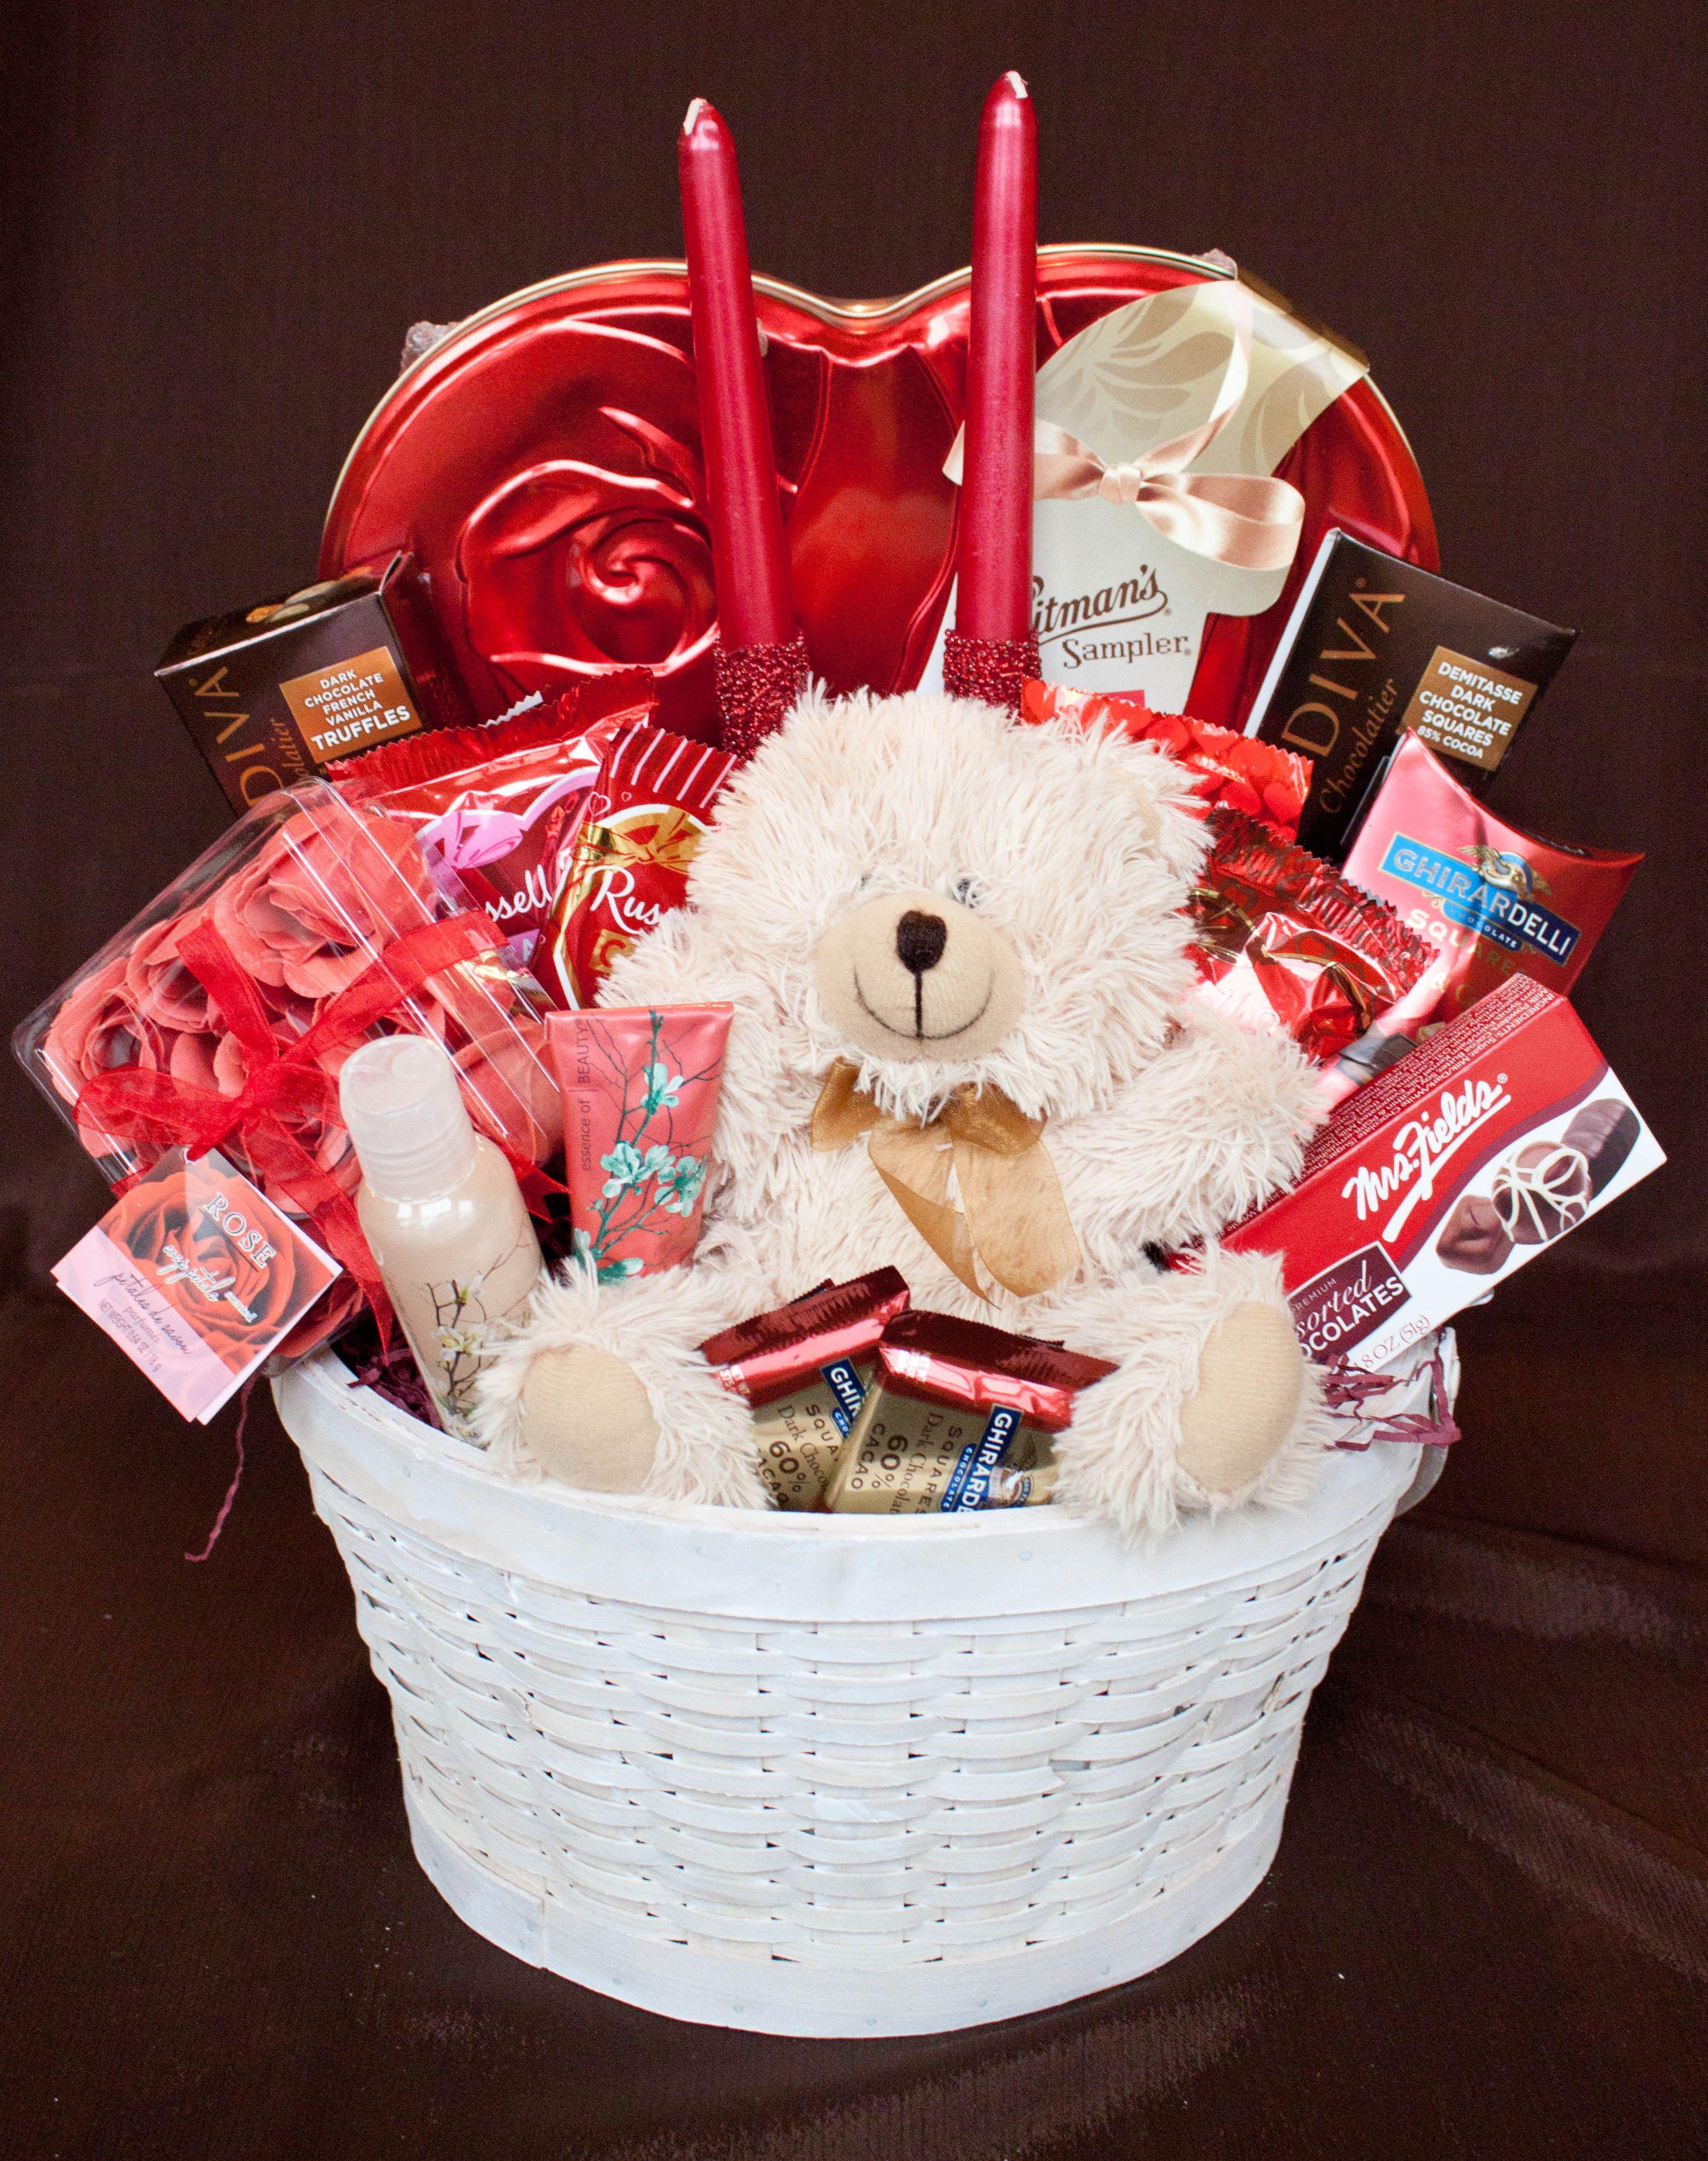 Valentines Day Gift Basket Ideas  Valentine Basket Something Wonderful Baskets